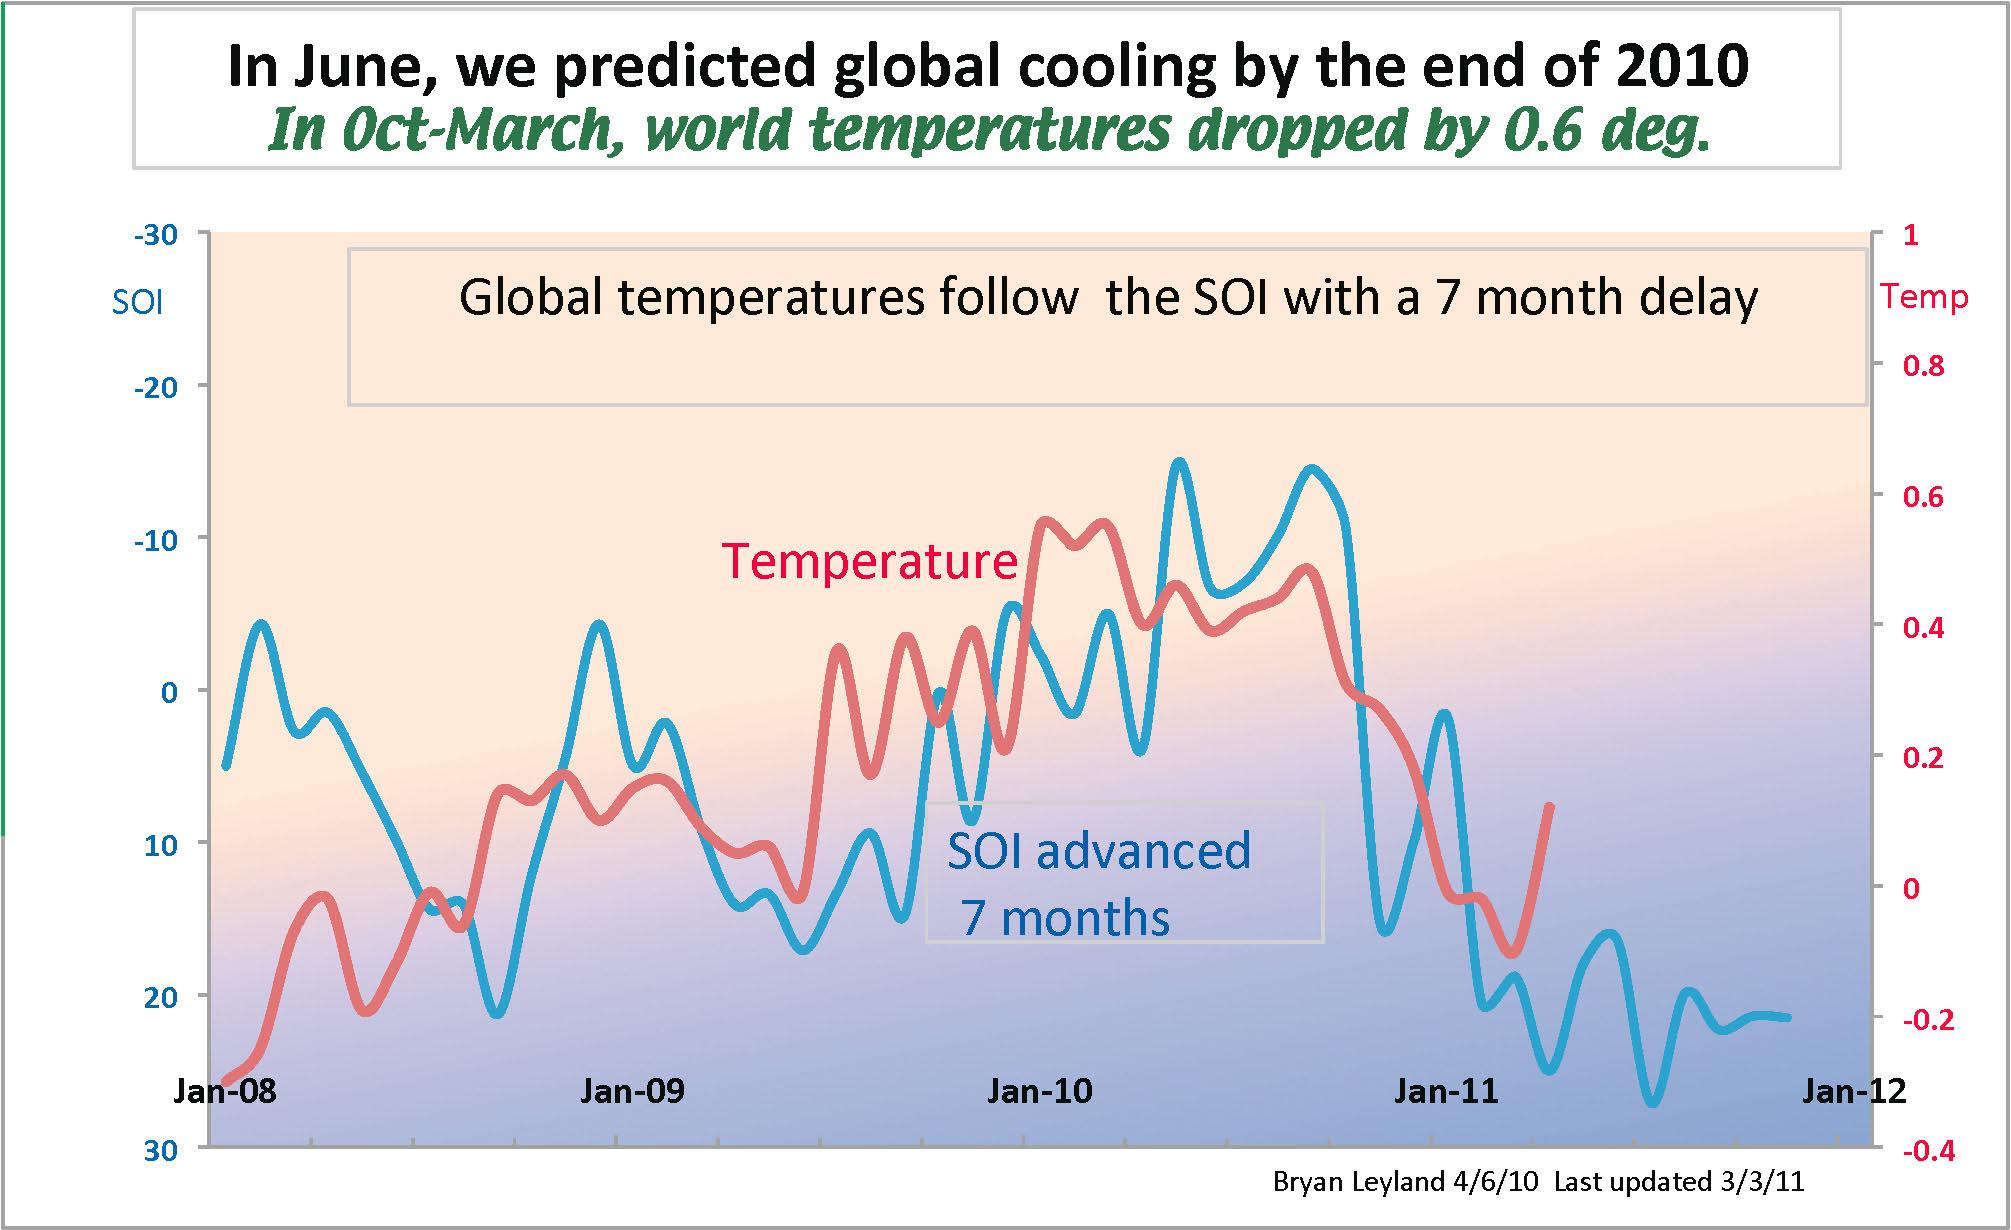 Leyland global temp prediction